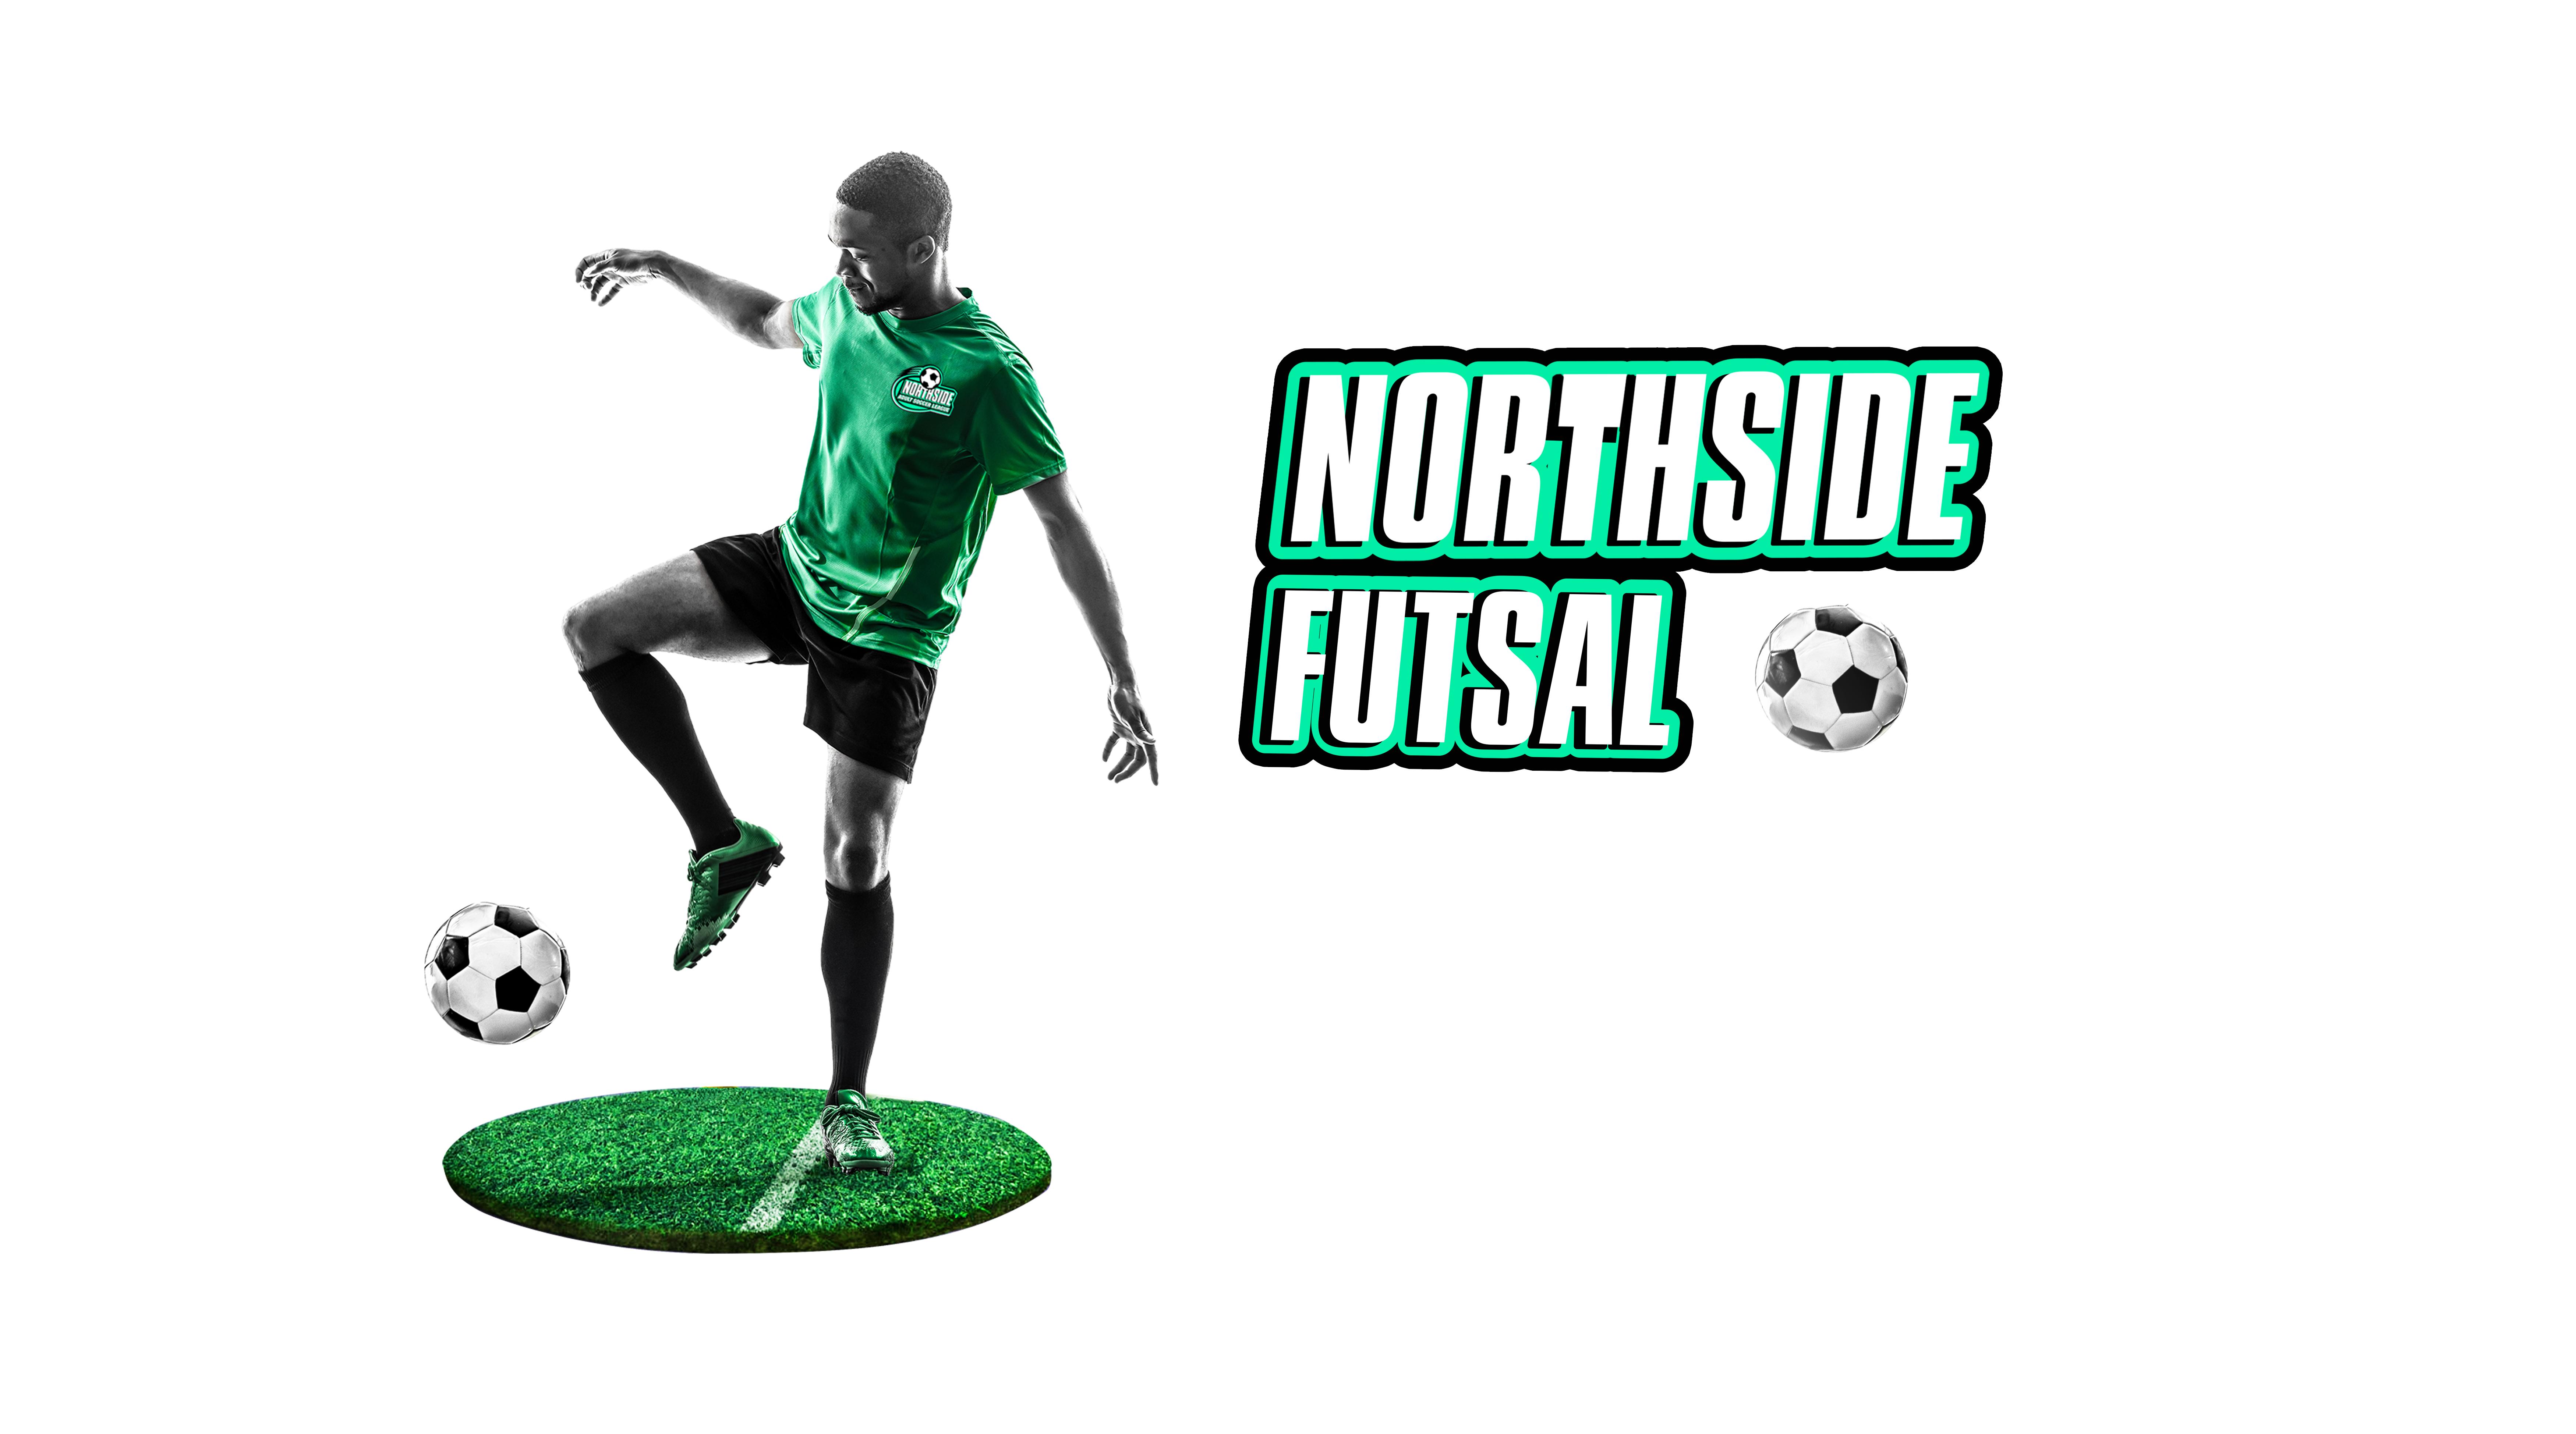 NS futsal team registration Page heroImg